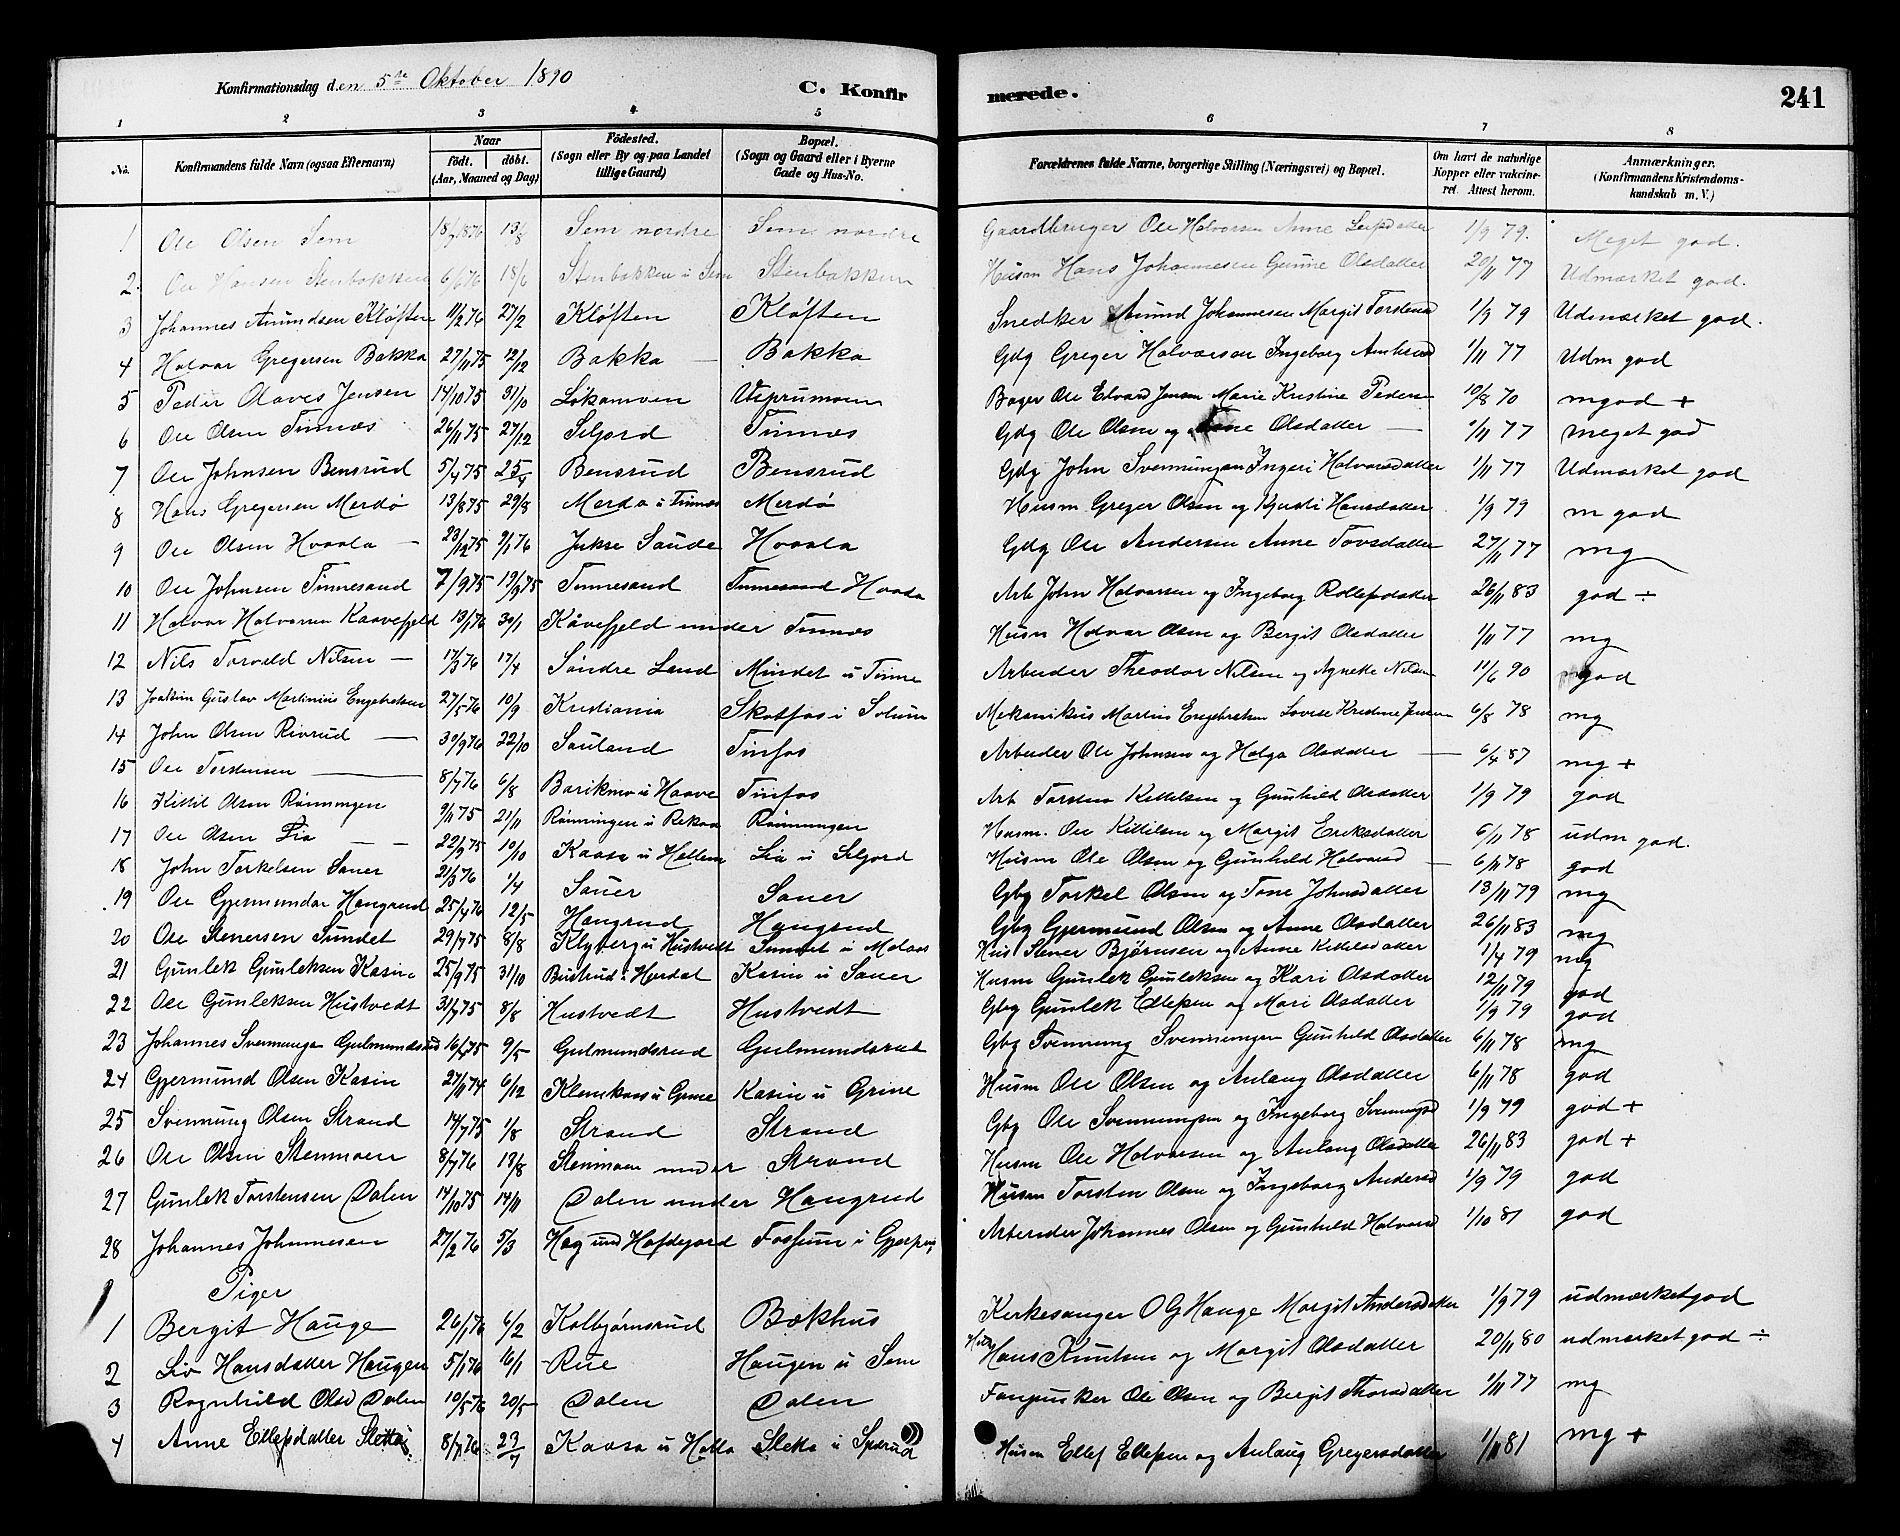 SAKO, Heddal kirkebøker, G/Ga/L0002: Klokkerbok nr. I 2, 1879-1908, s. 241